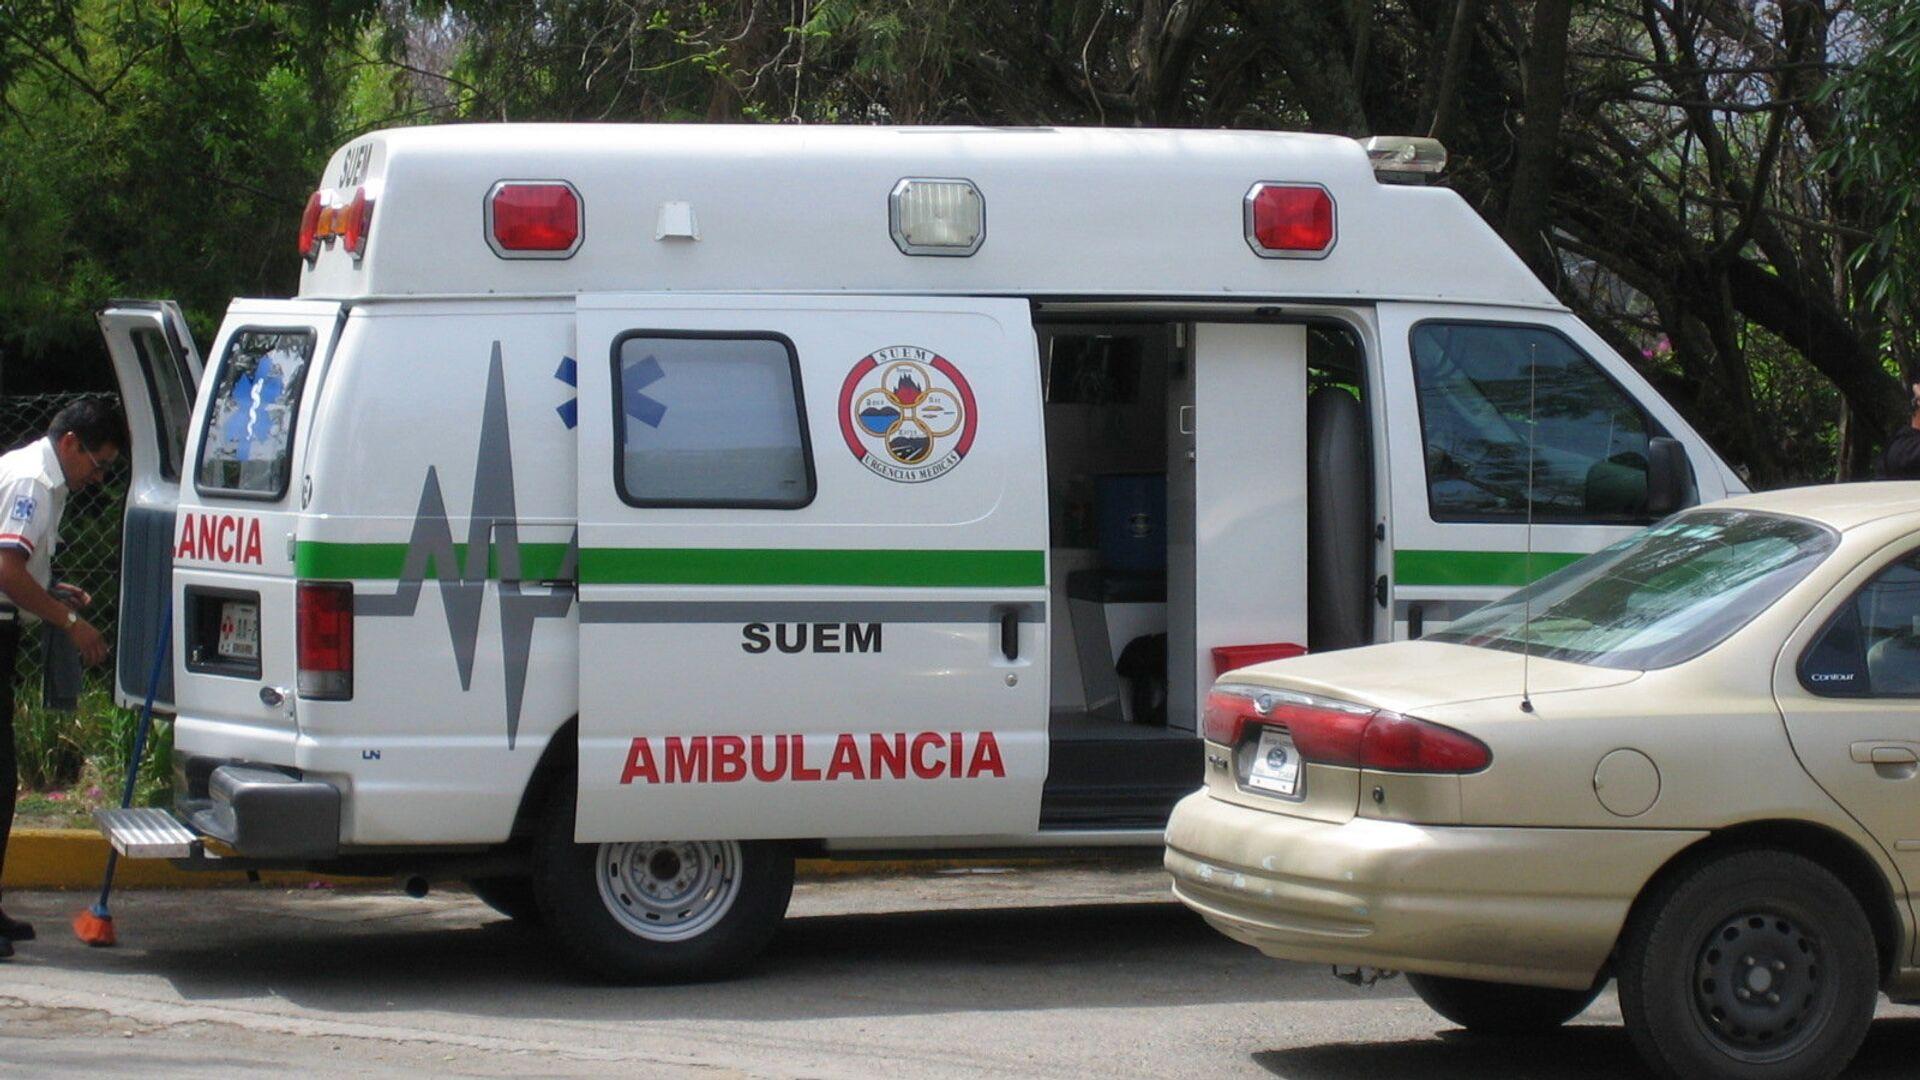 Ambulancia mexicana (archivo) - Sputnik Mundo, 1920, 16.08.2021